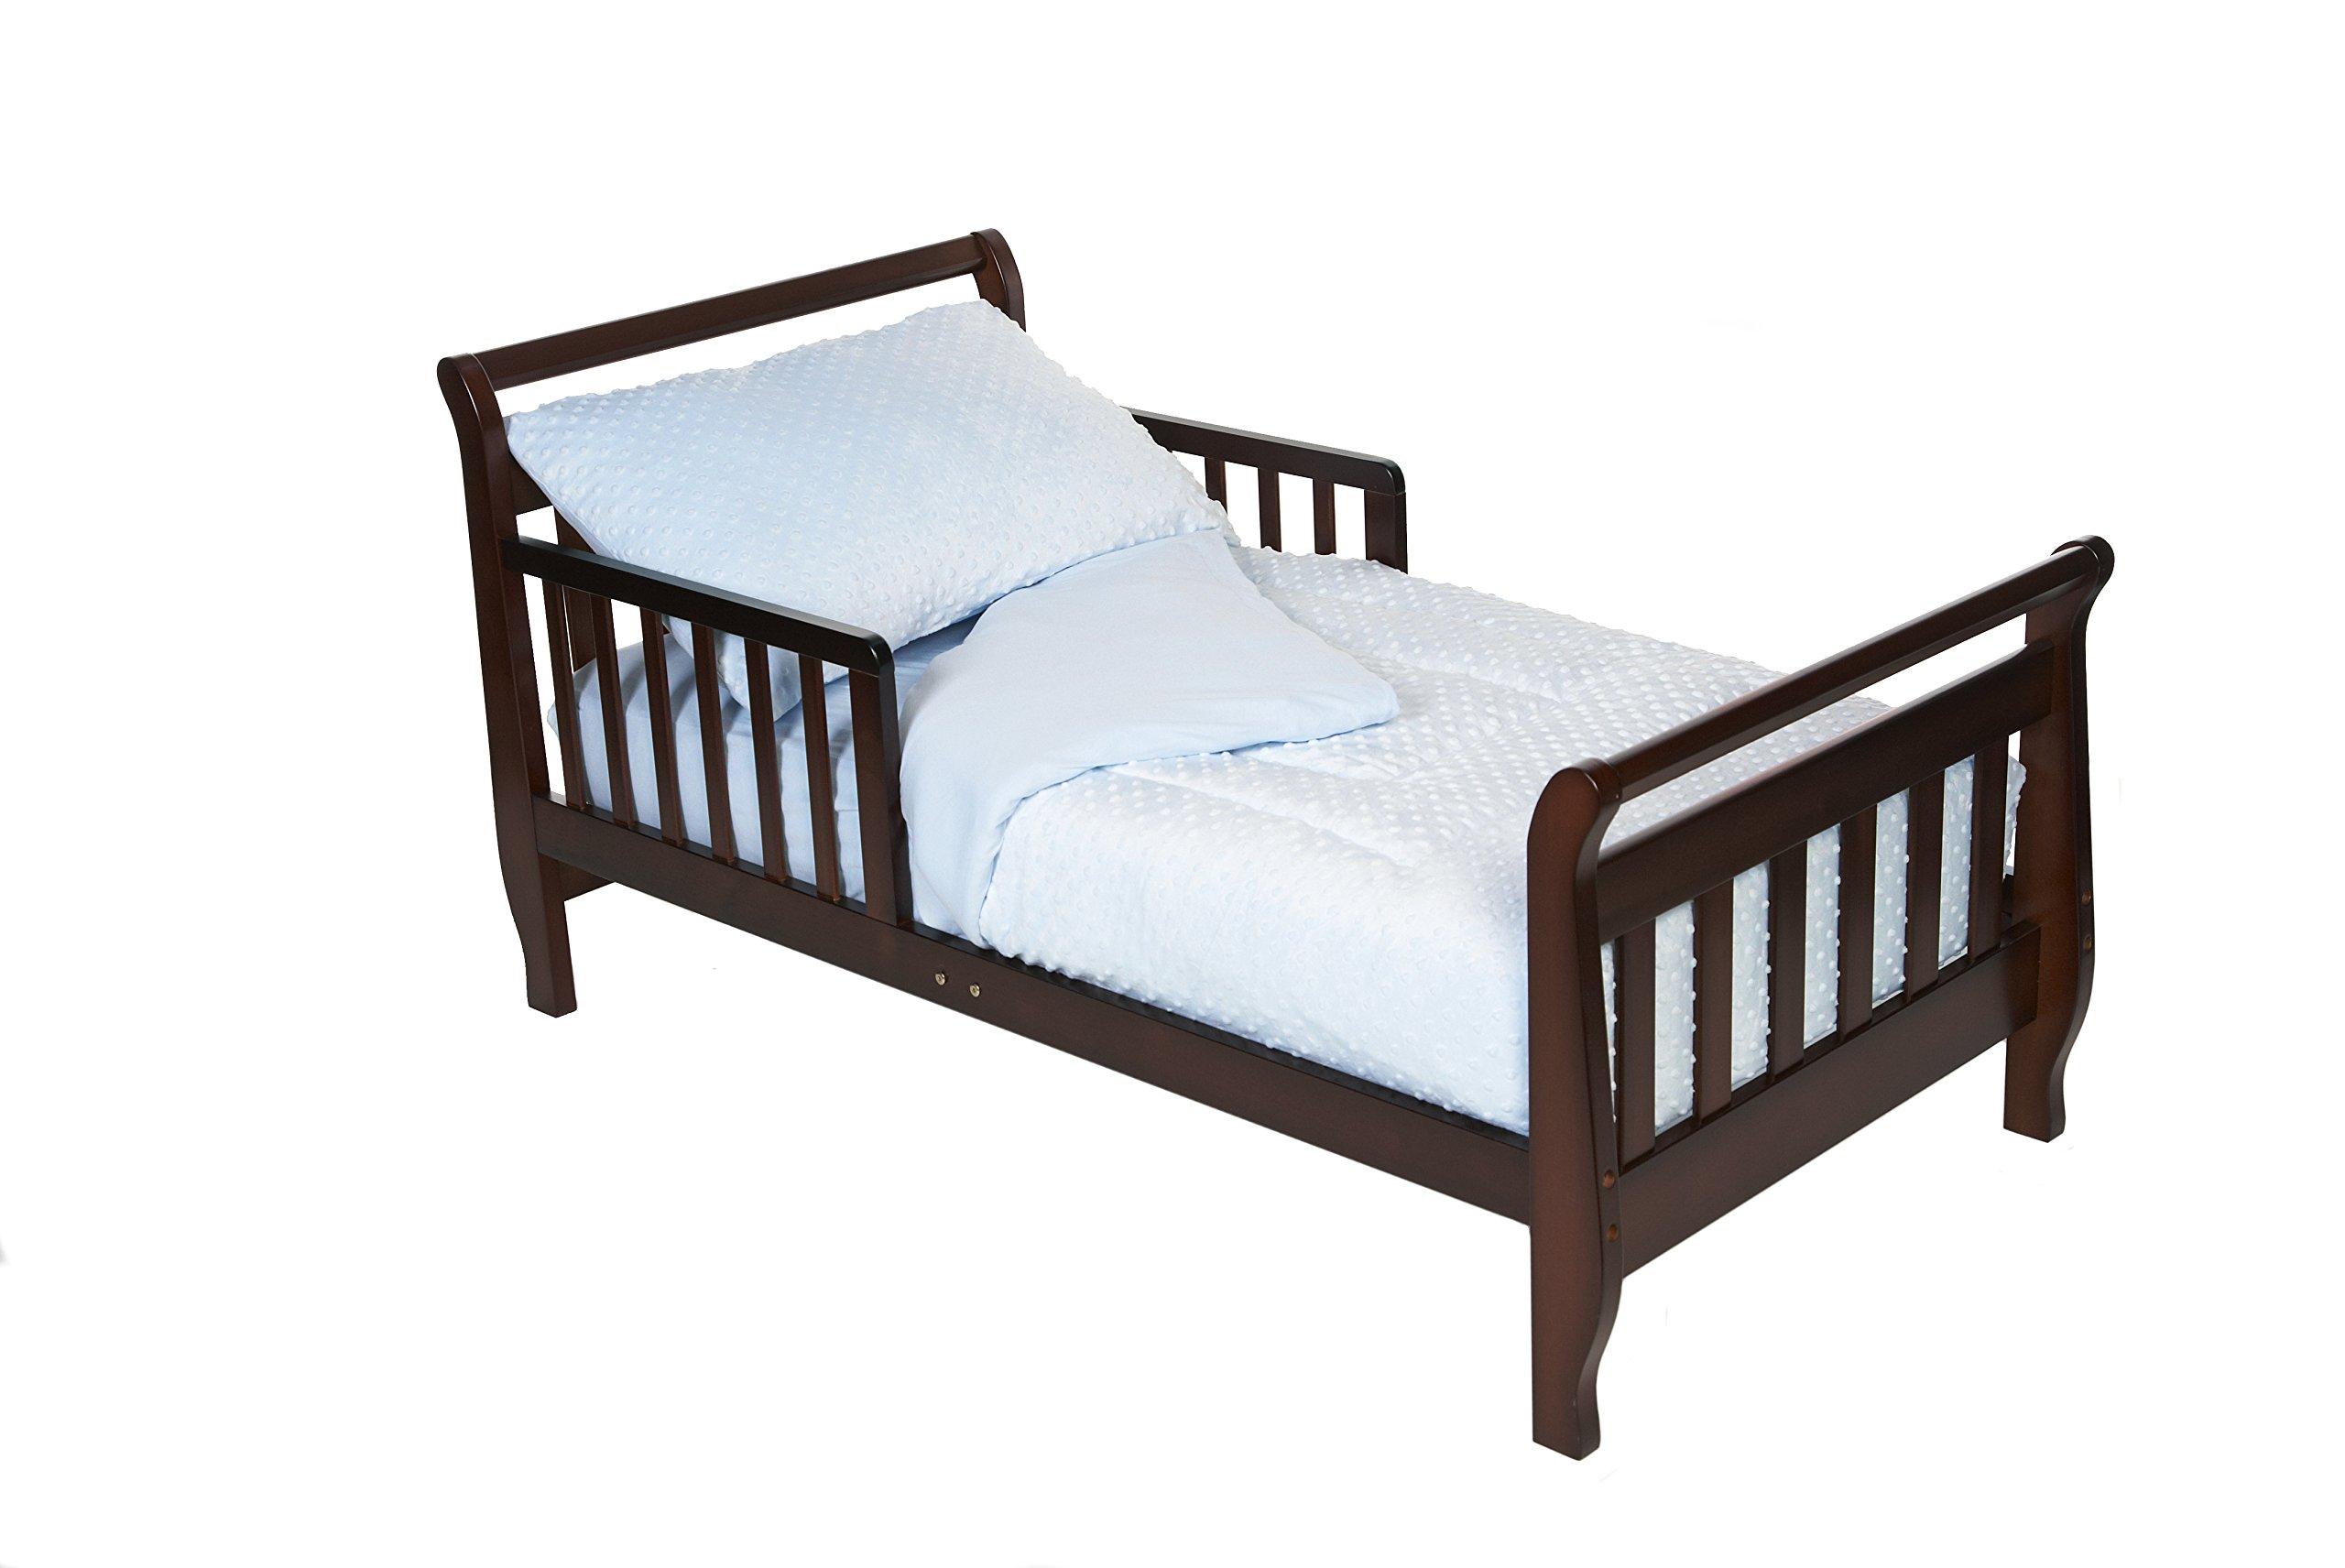 buy garanimals dinosaurs 4 piece toddler bedding set blue and red